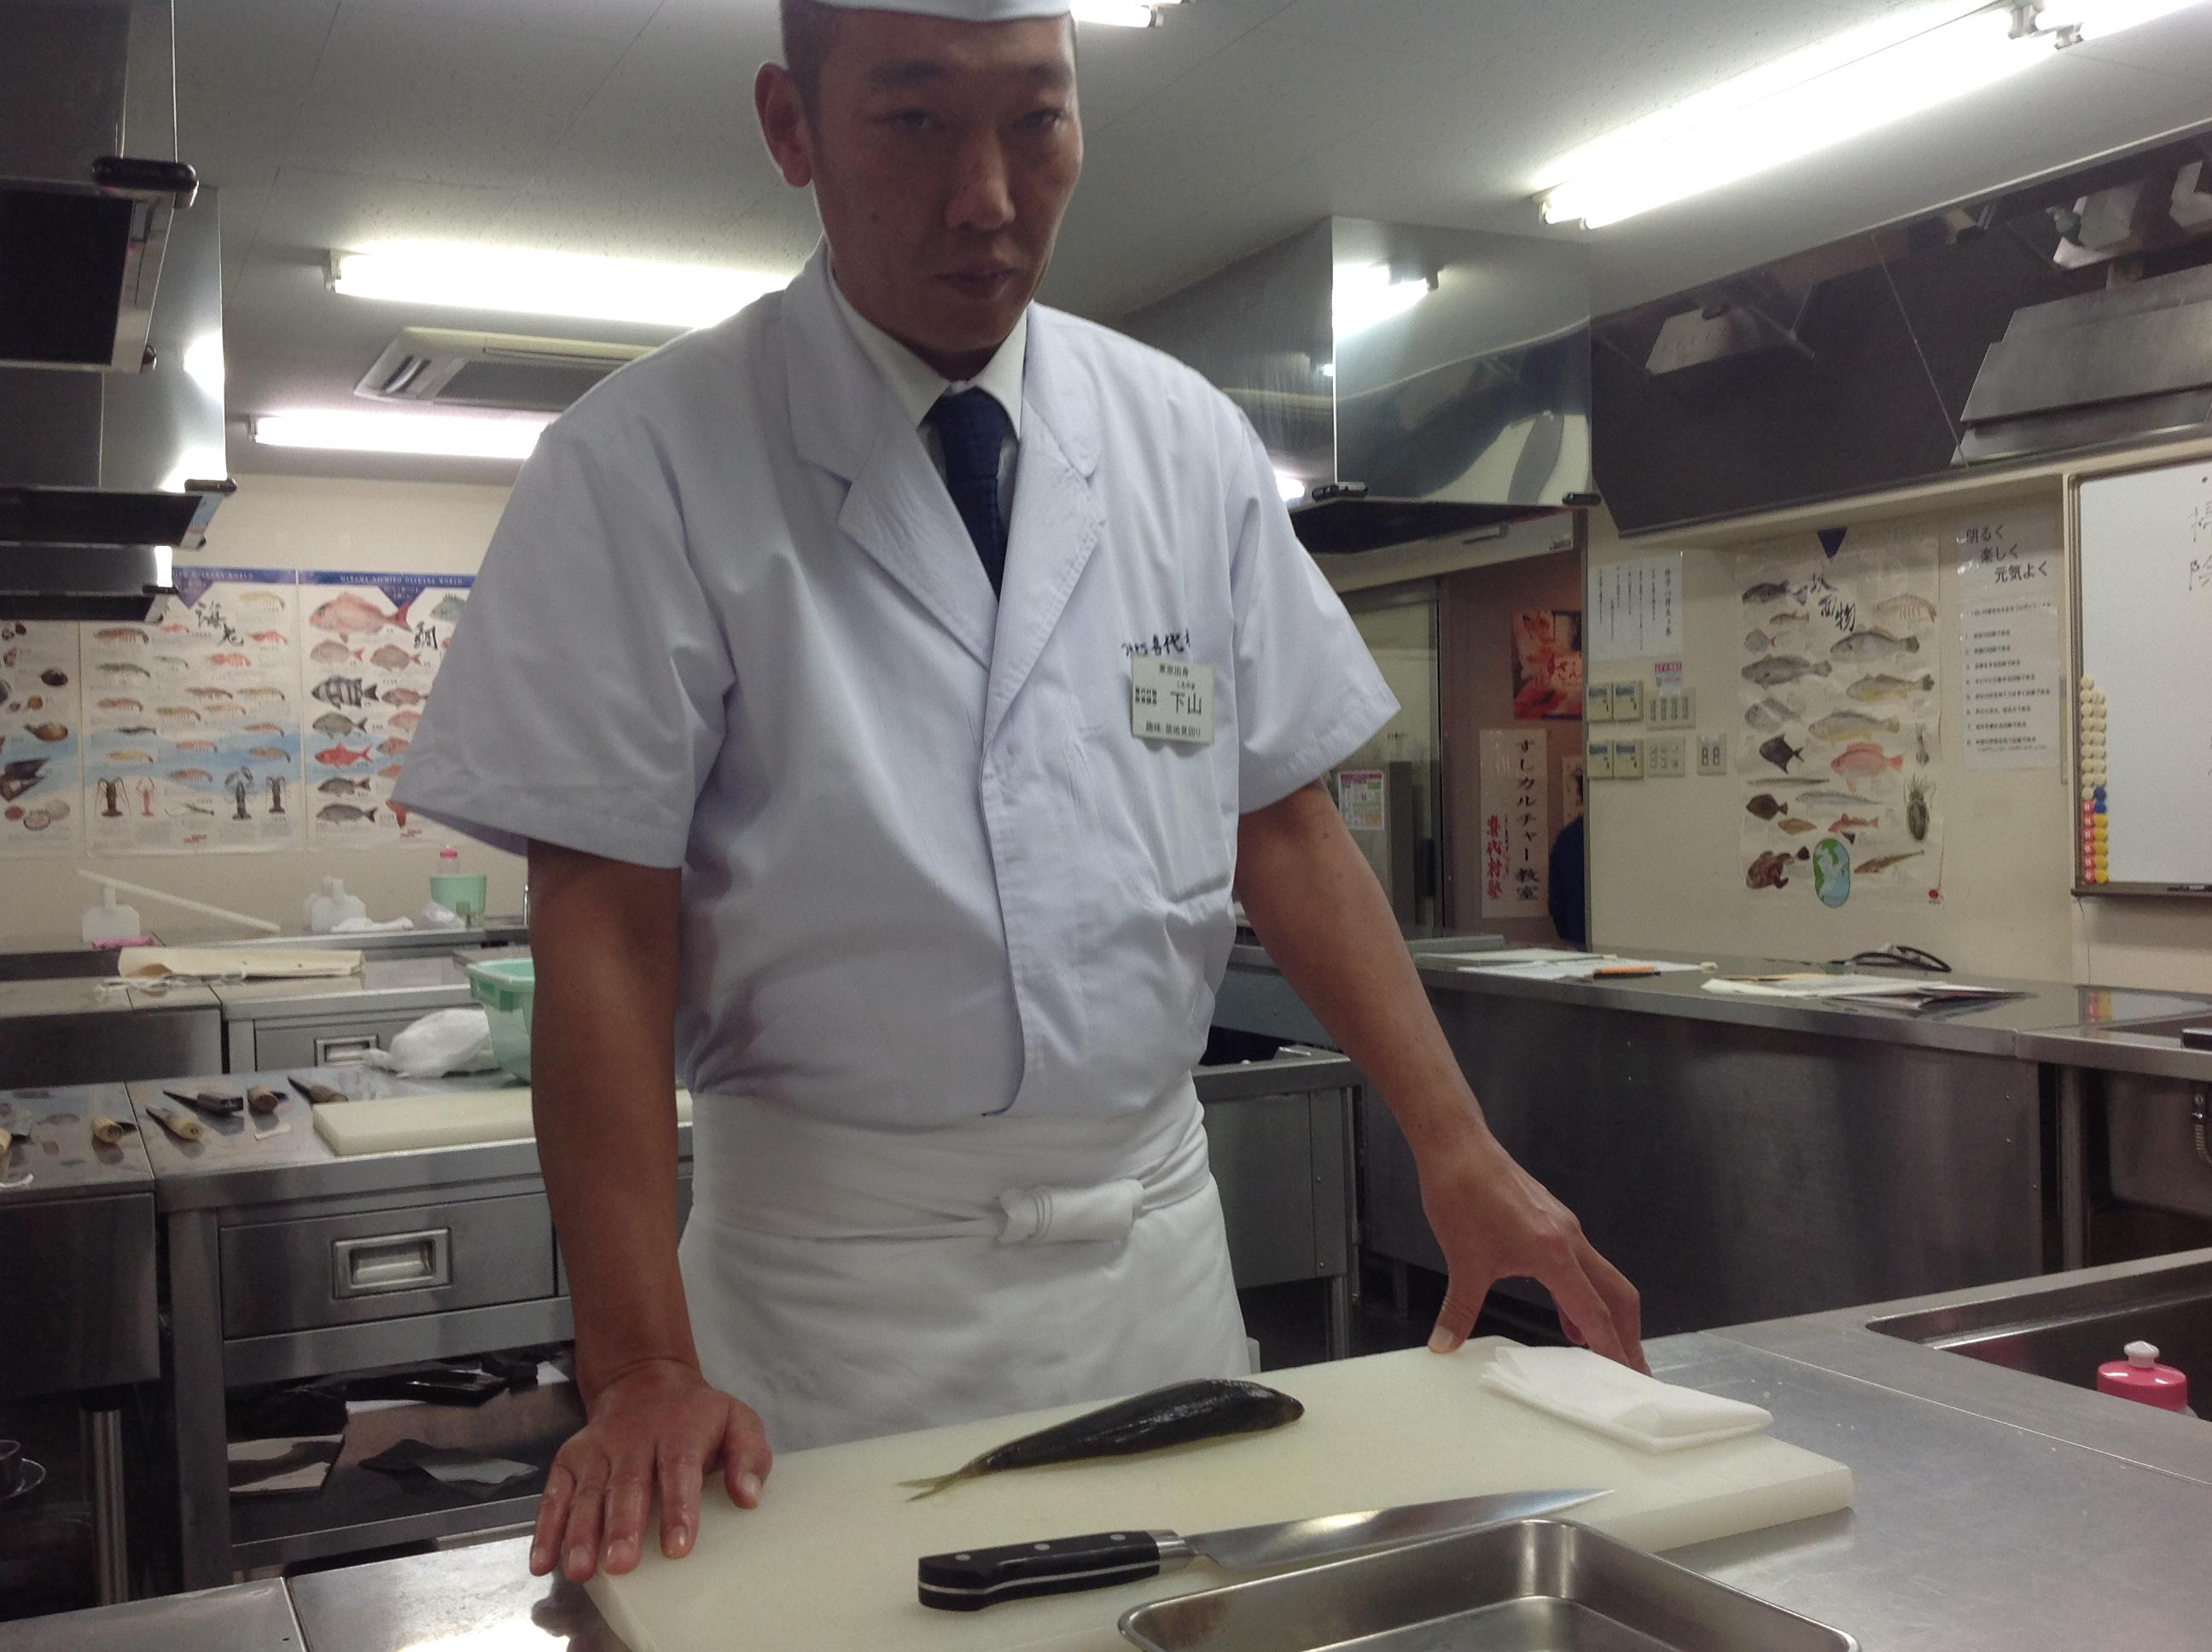 japan sushi IMG_5136 - ljsantos